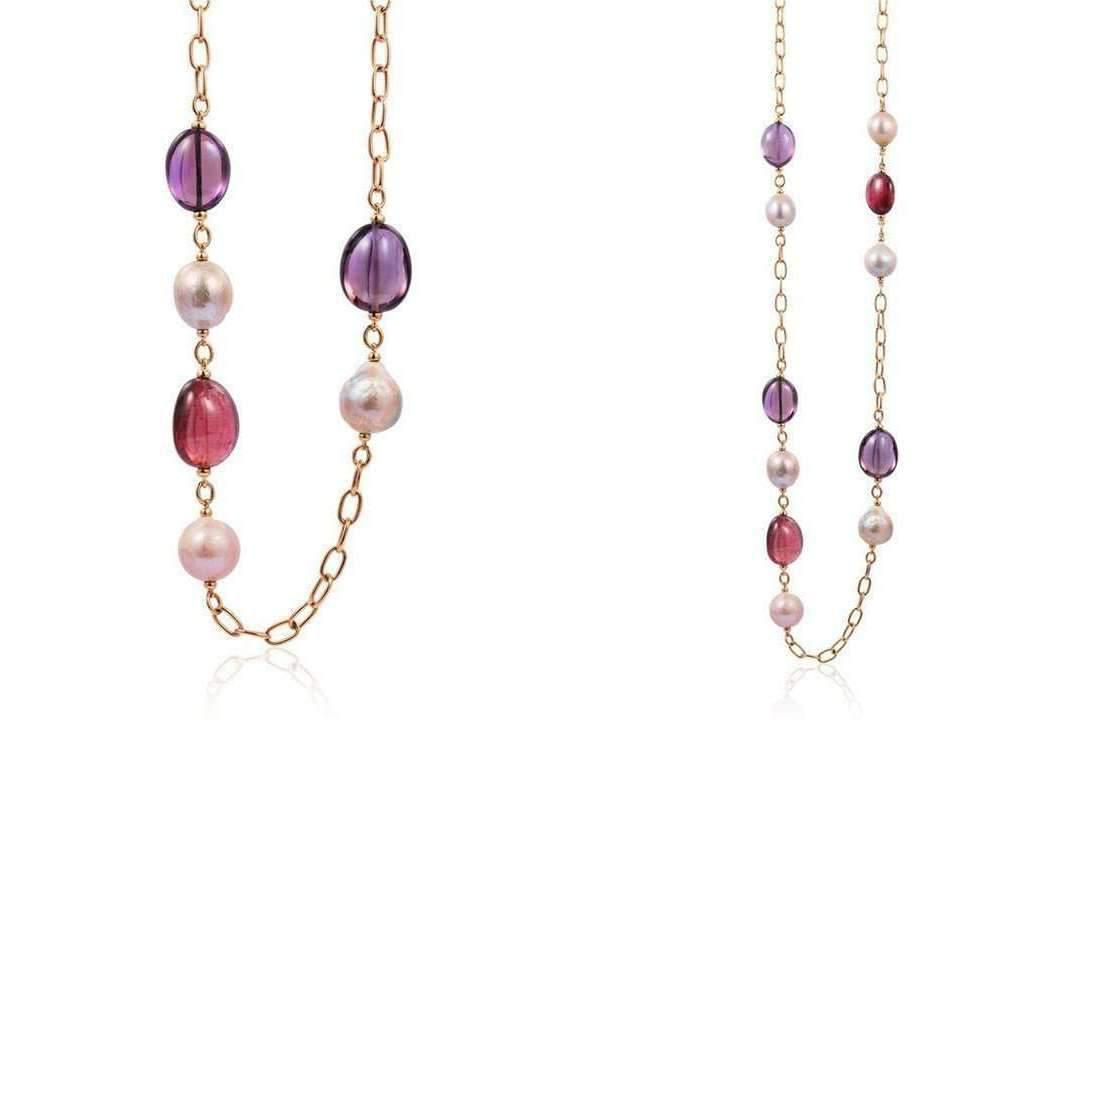 Goshwara Beyond Blue Topaz, Peridot & Pearl Necklaces